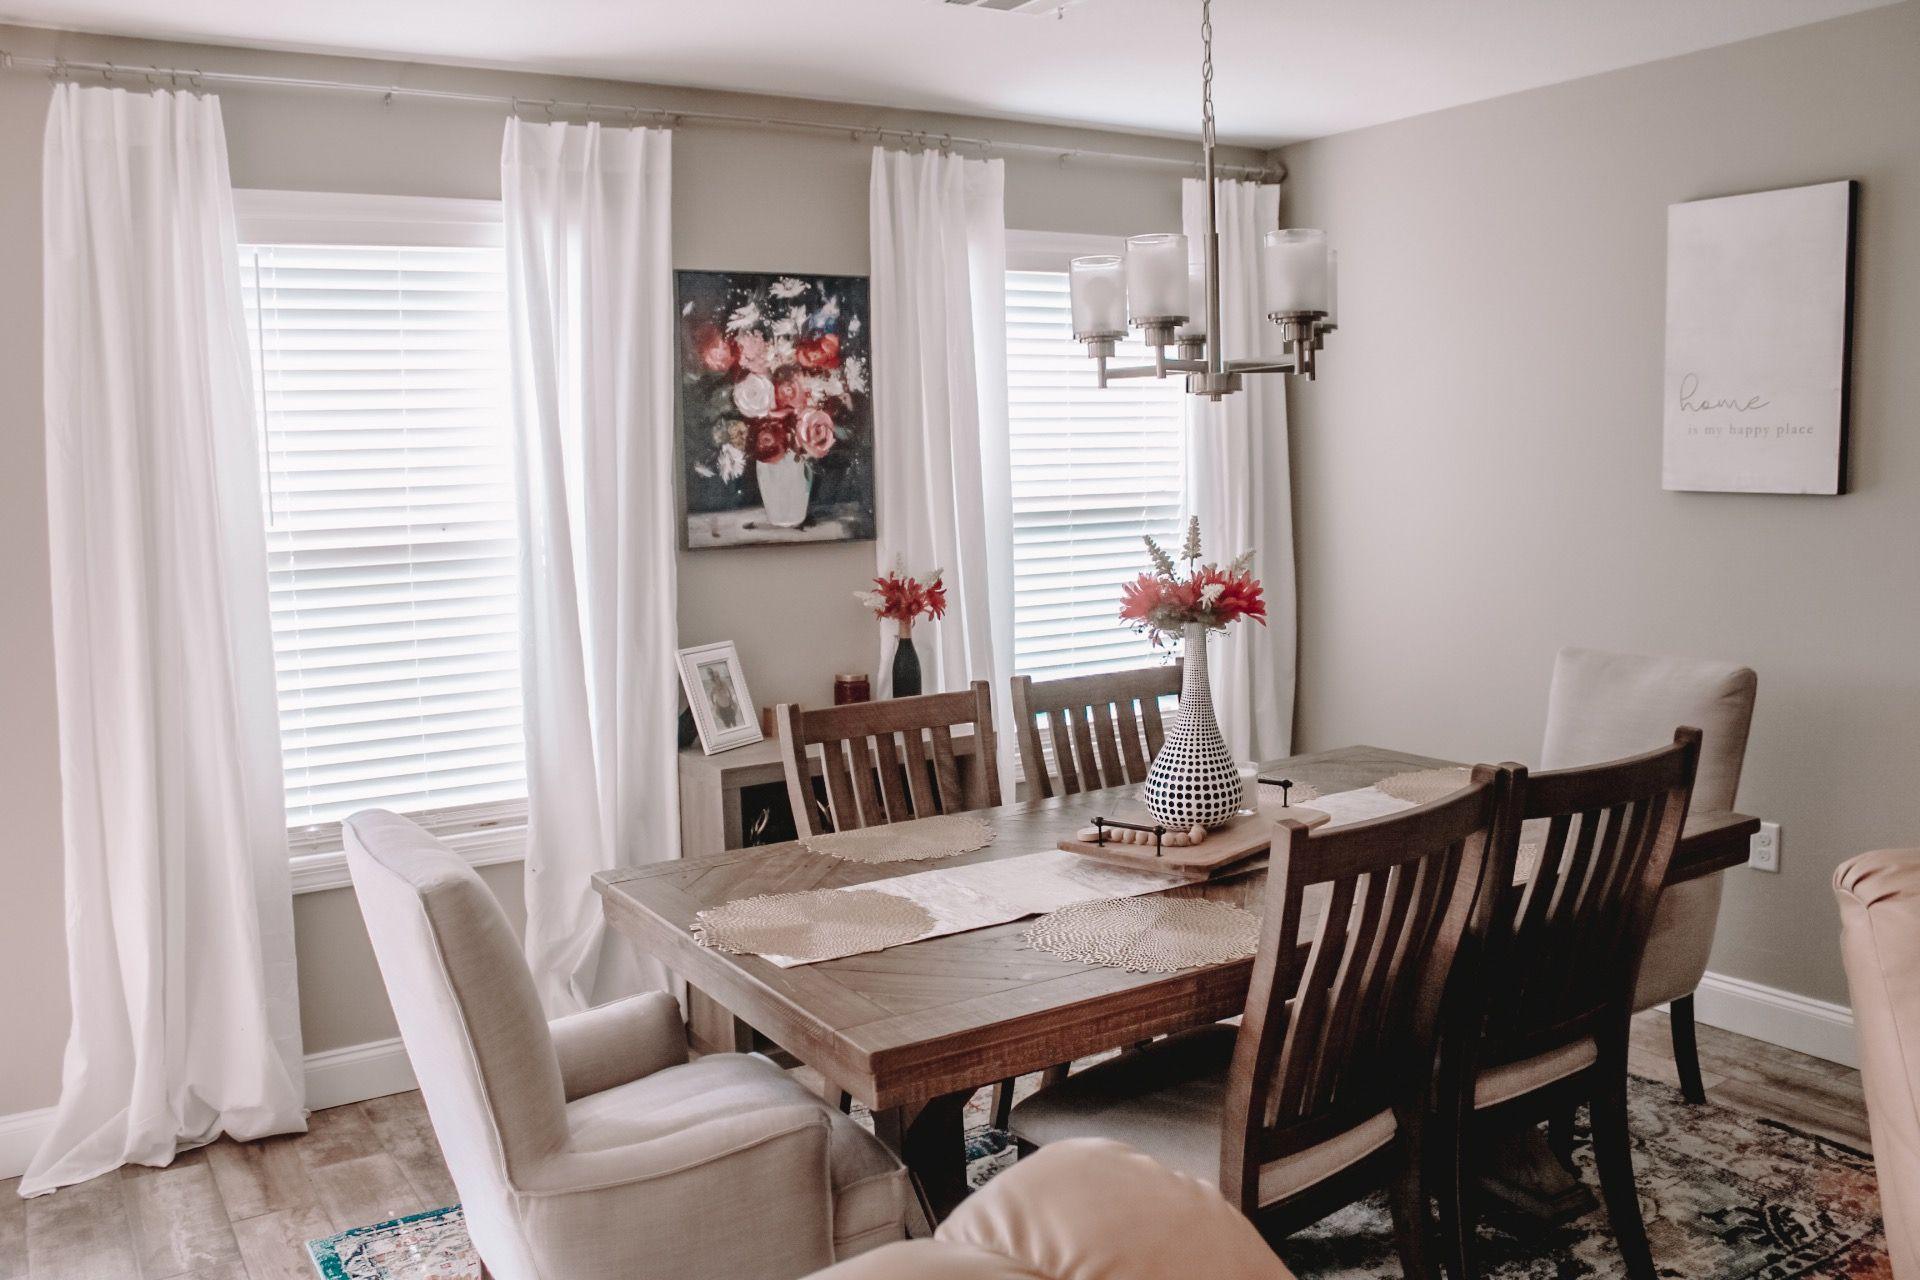 Ashley furniture dining room set, flat sheet curtains